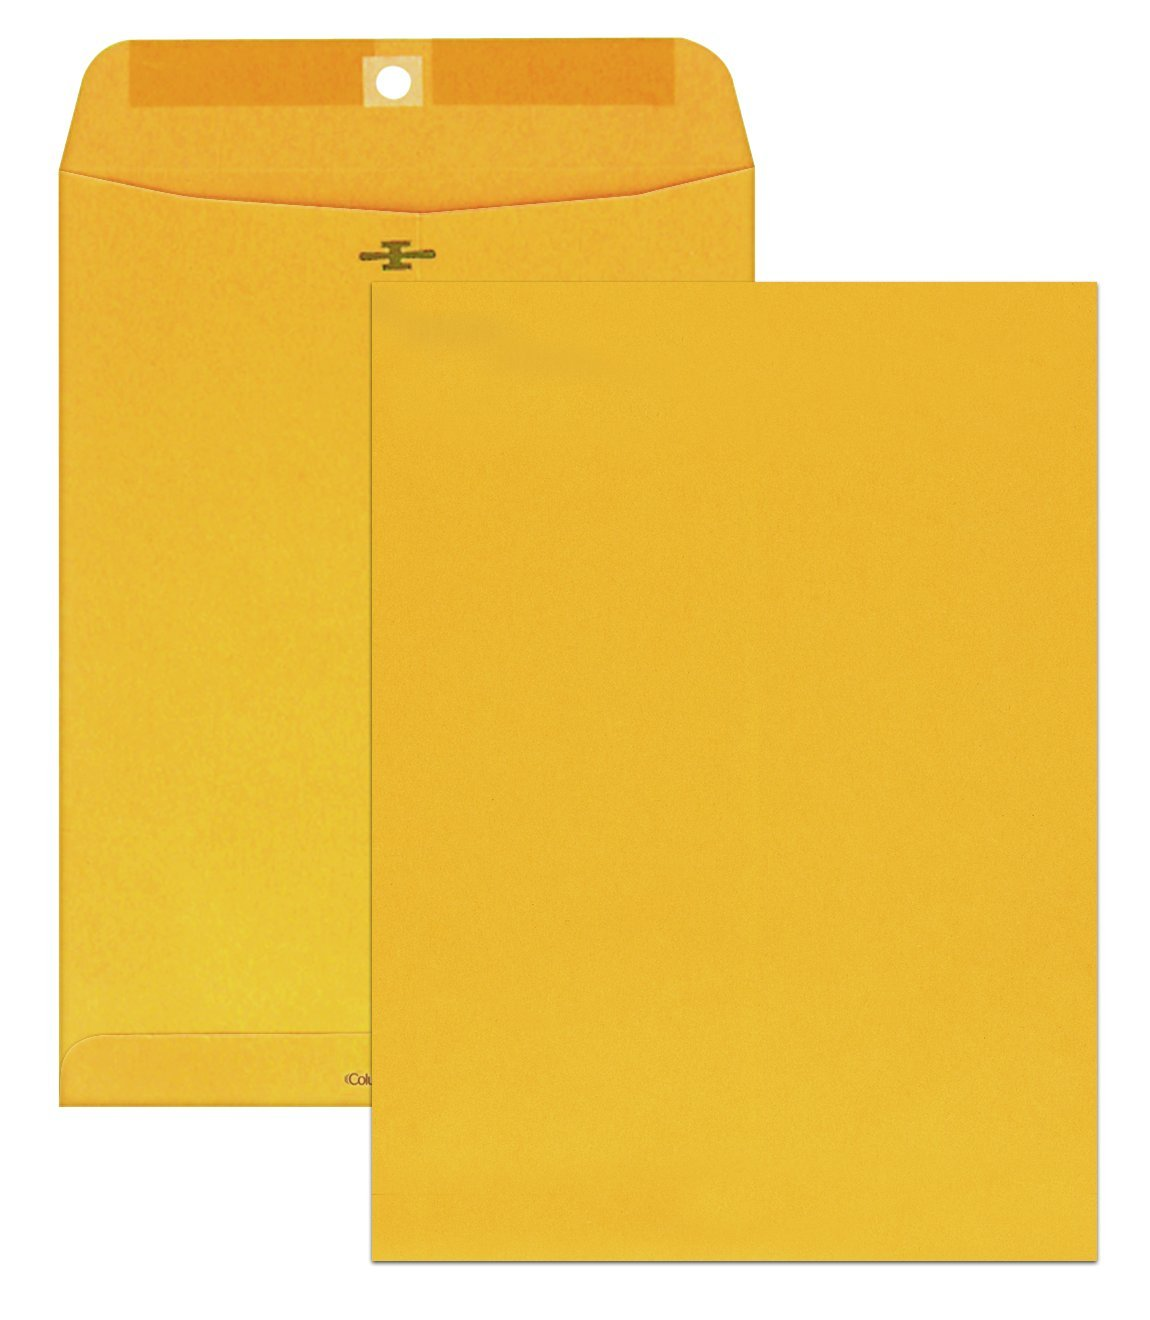 how to write address on large envelope canada